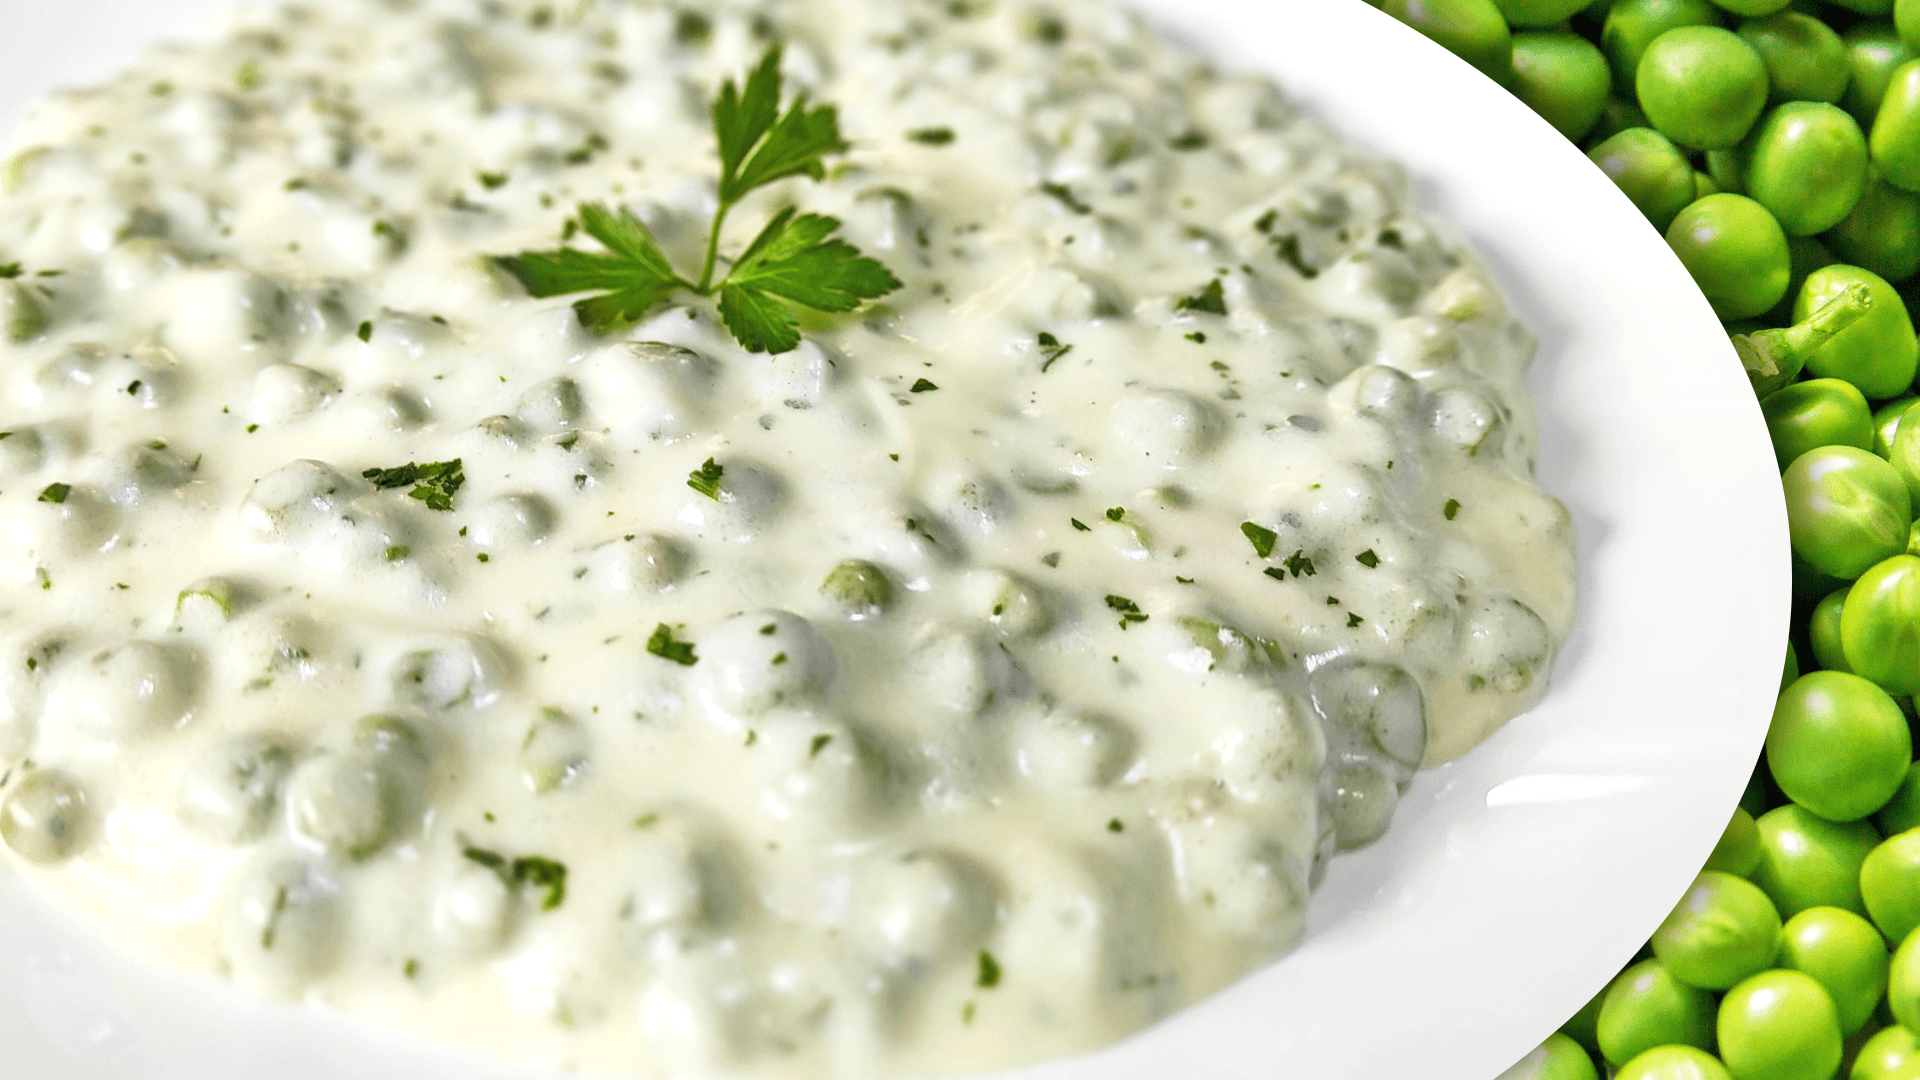 Easy Pea Recipe | Cooking Green Peas in Sour Cream Sauce